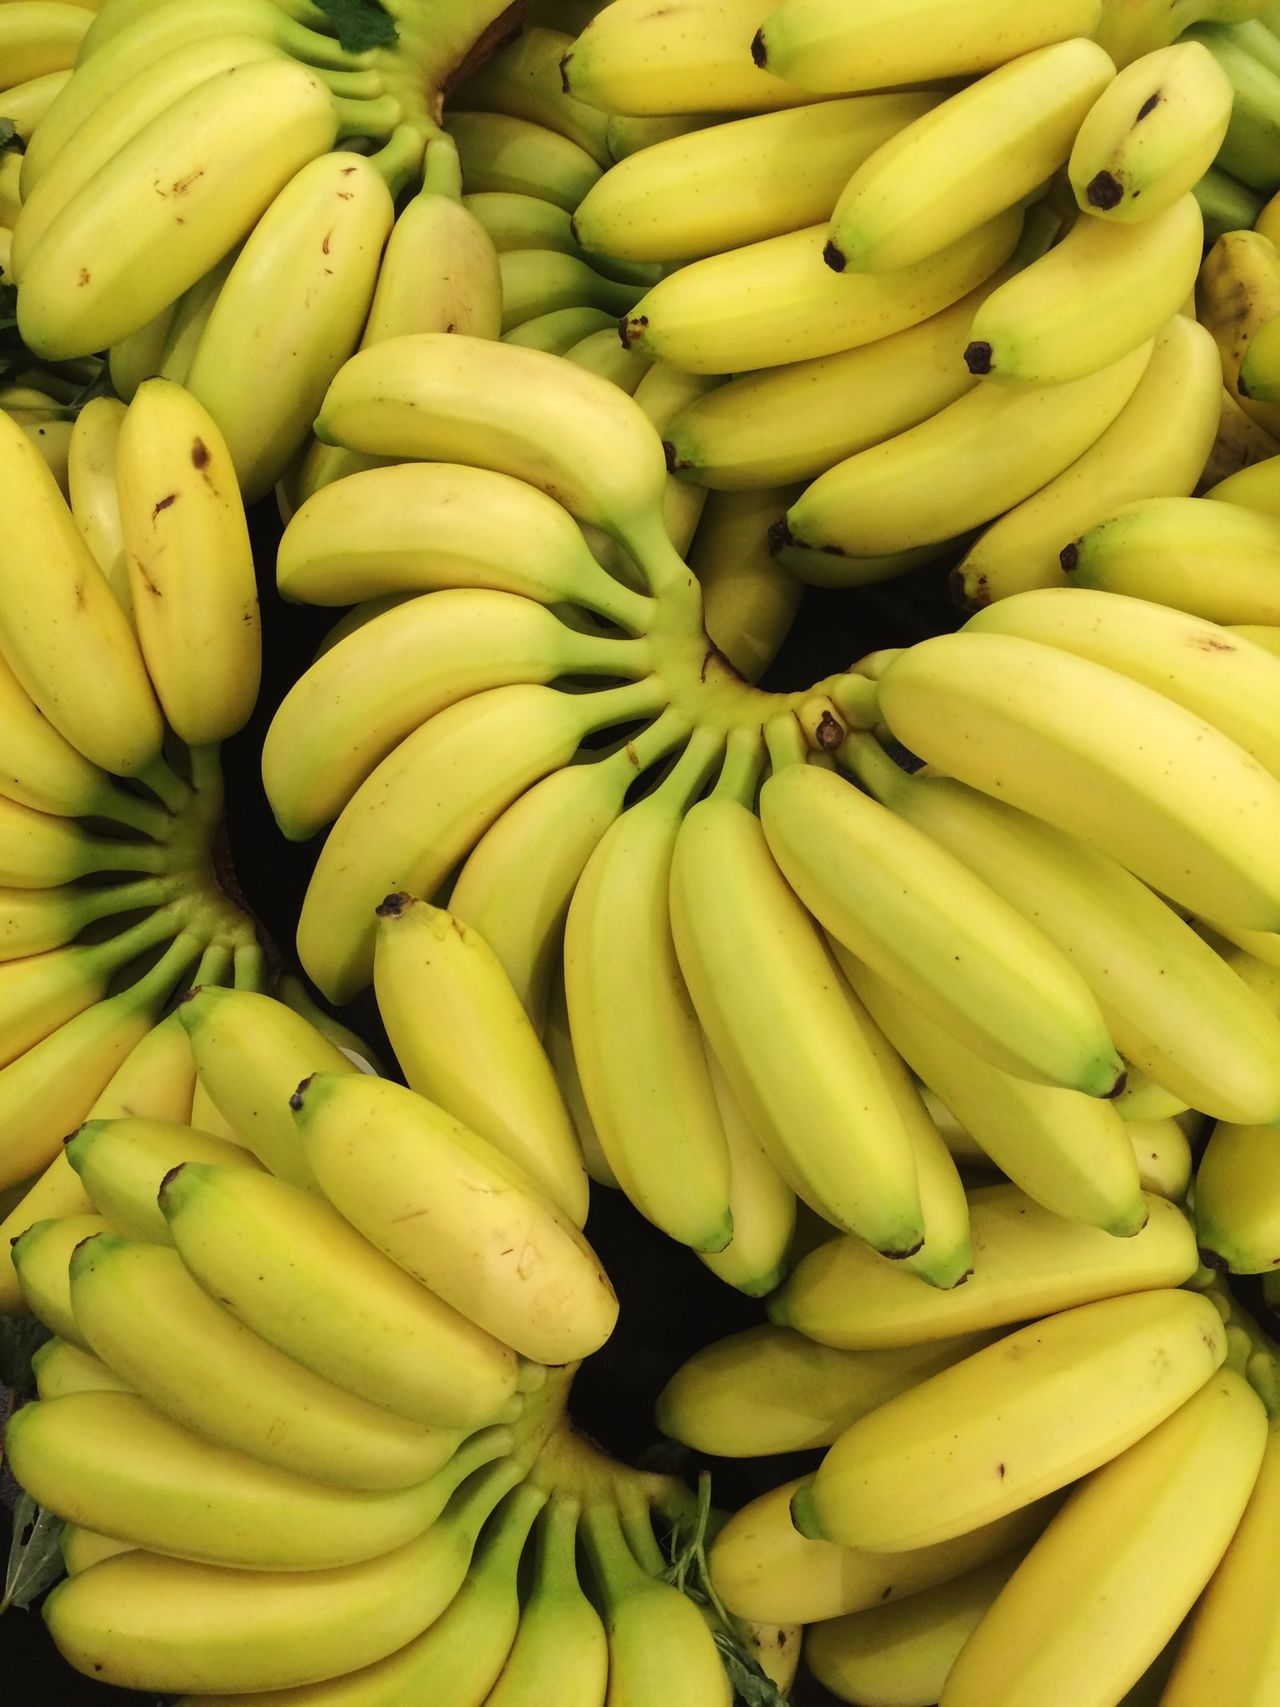 Bananas Fresh Produce Fruit Yellow Grocery